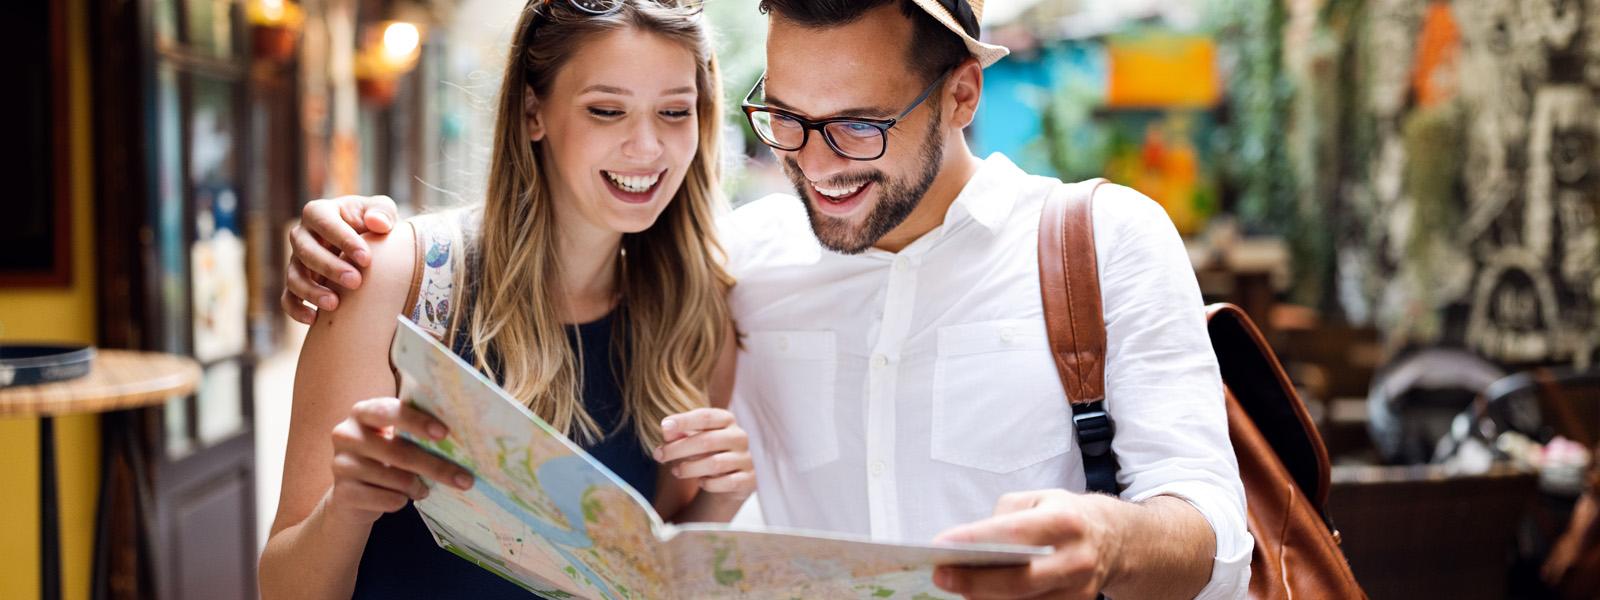 Travelling INTERNALLY will help you to progress EXTERNALLY.